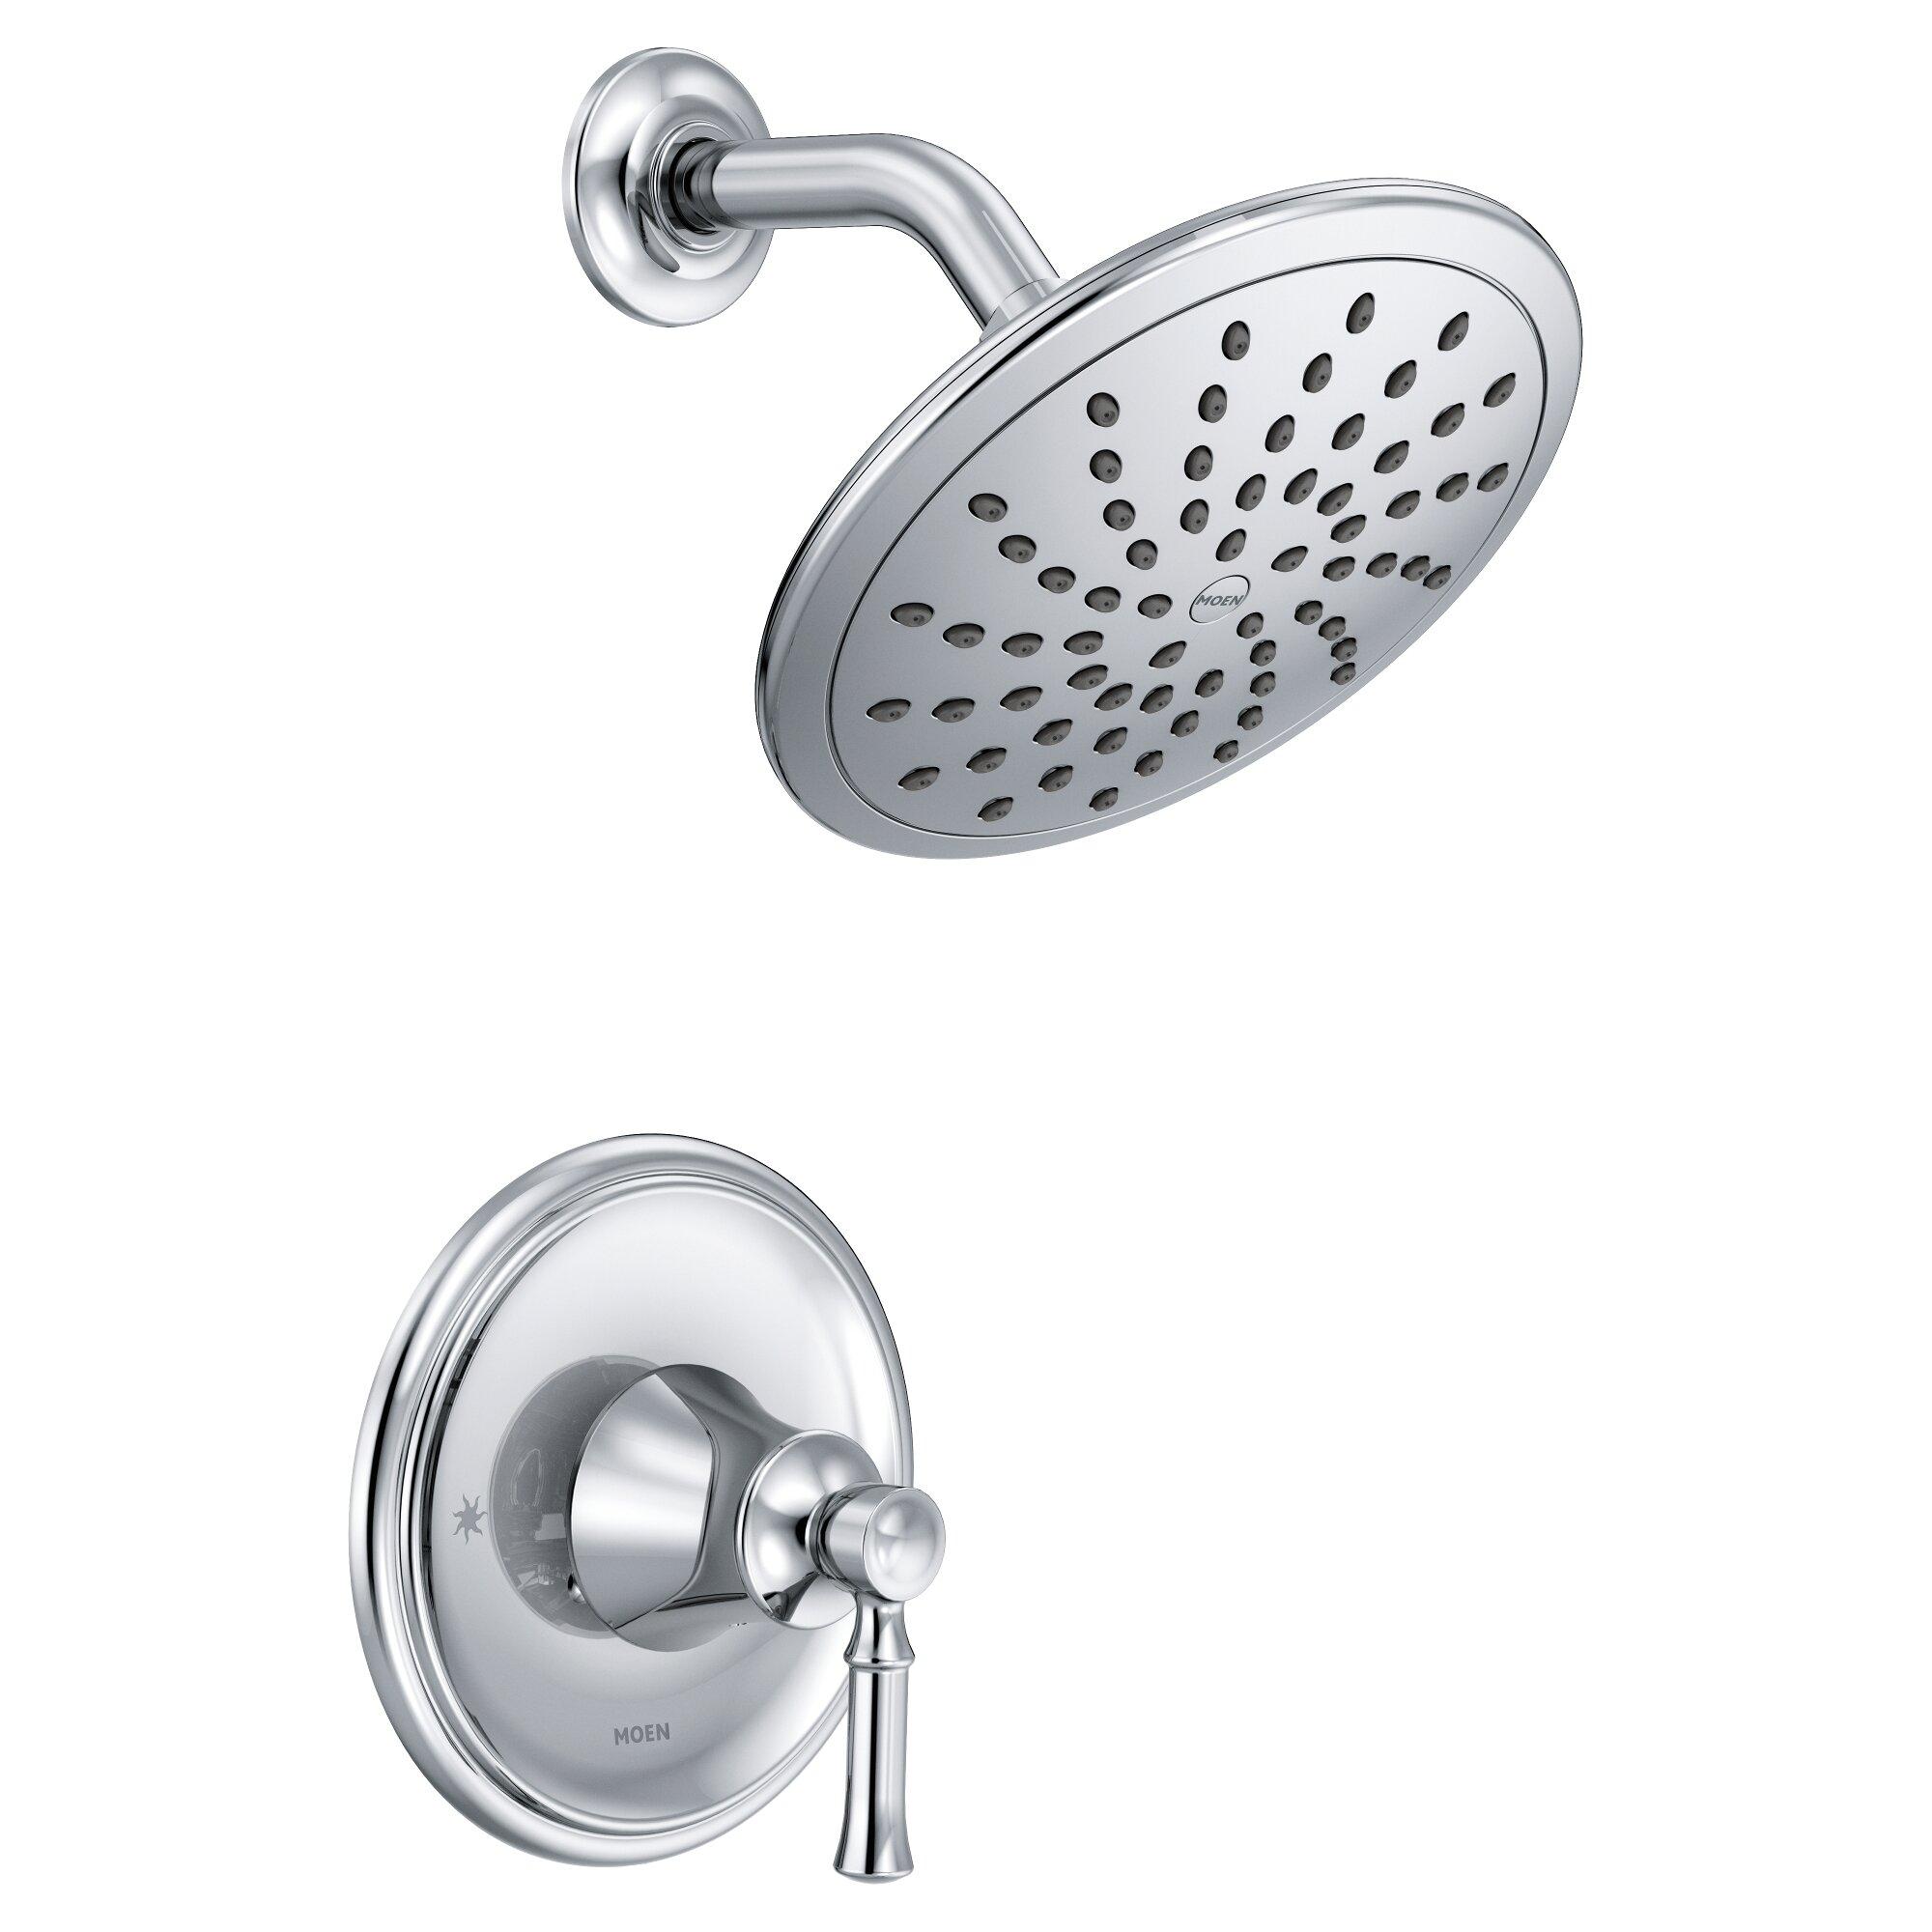 moen dartmoor pressure balance shower faucet with lever handle moen 3 handle shower faucet moenmoen banbury shower head bathing with a fulfilling shower